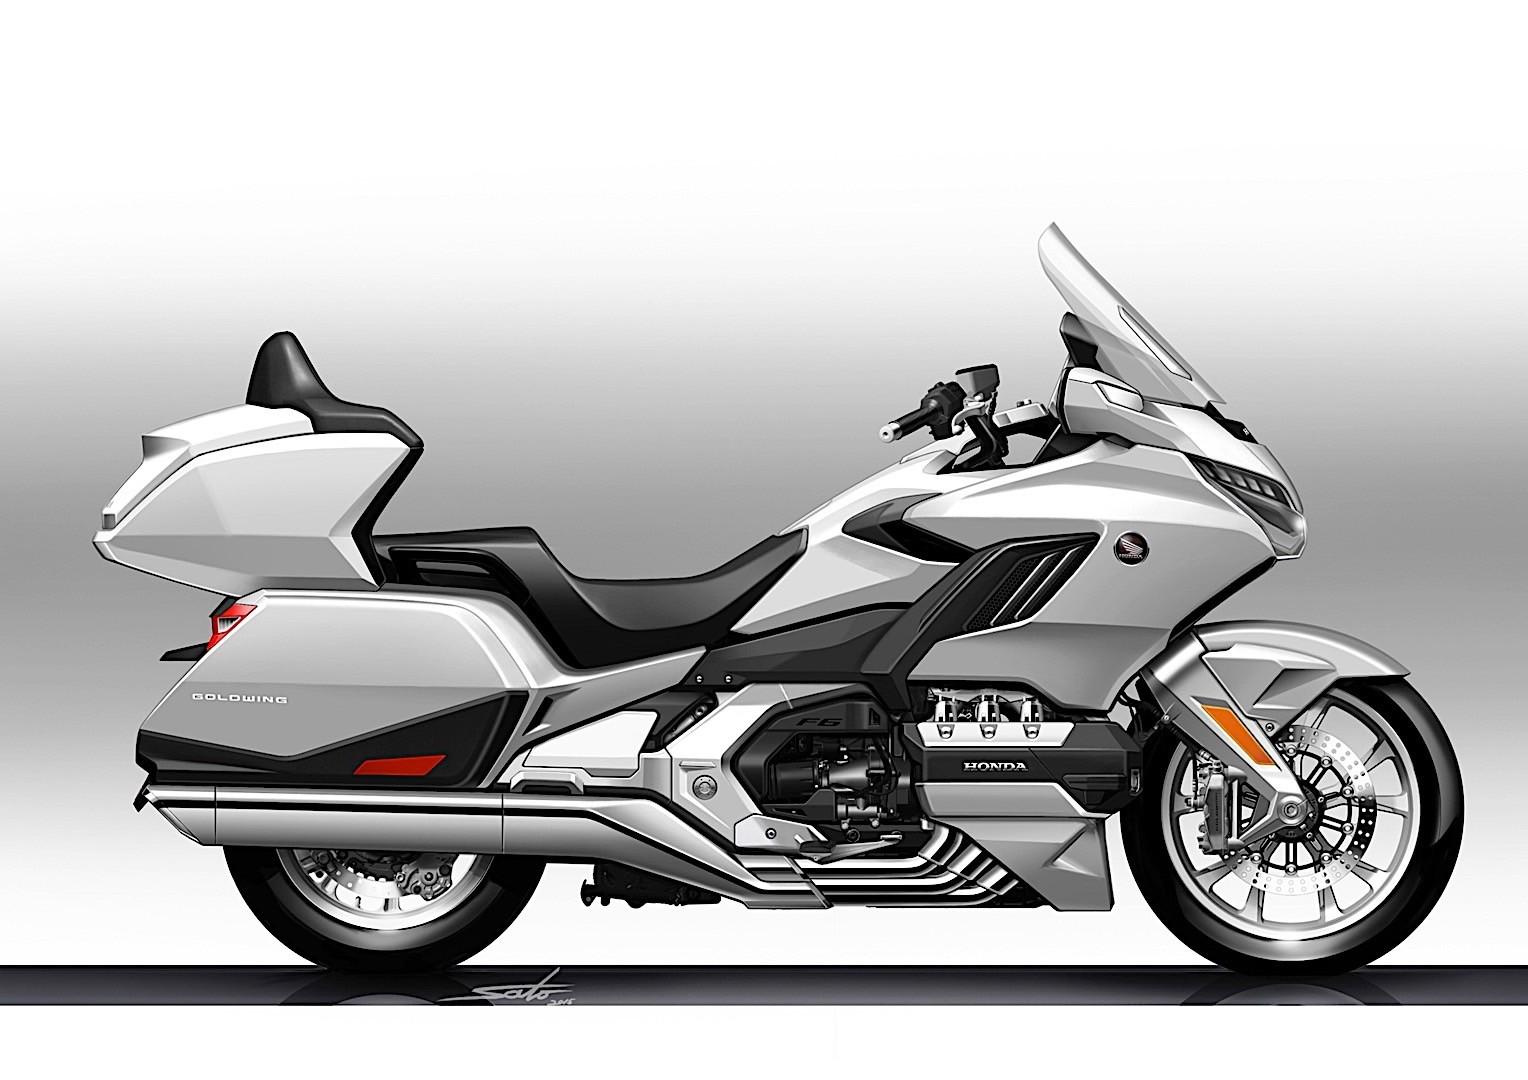 2018 Honda Valkyrie >> 2018 Honda Gold Wing Officially Revealed With Sharper Design - autoevolution